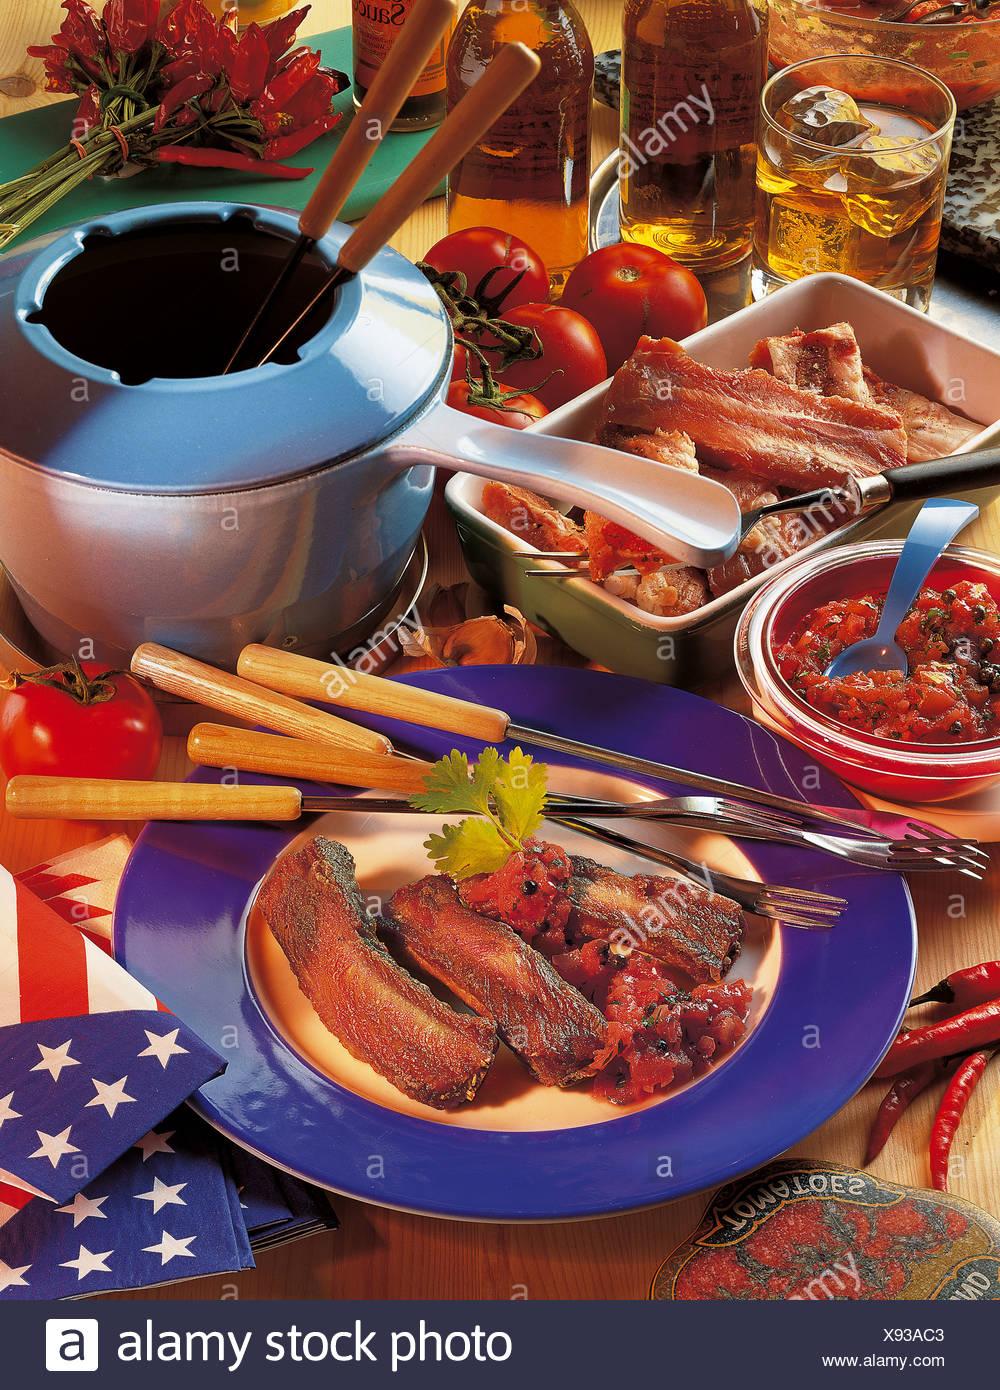 Texan spare ribs fondue, USA, recipe available for a fee - Stock Image